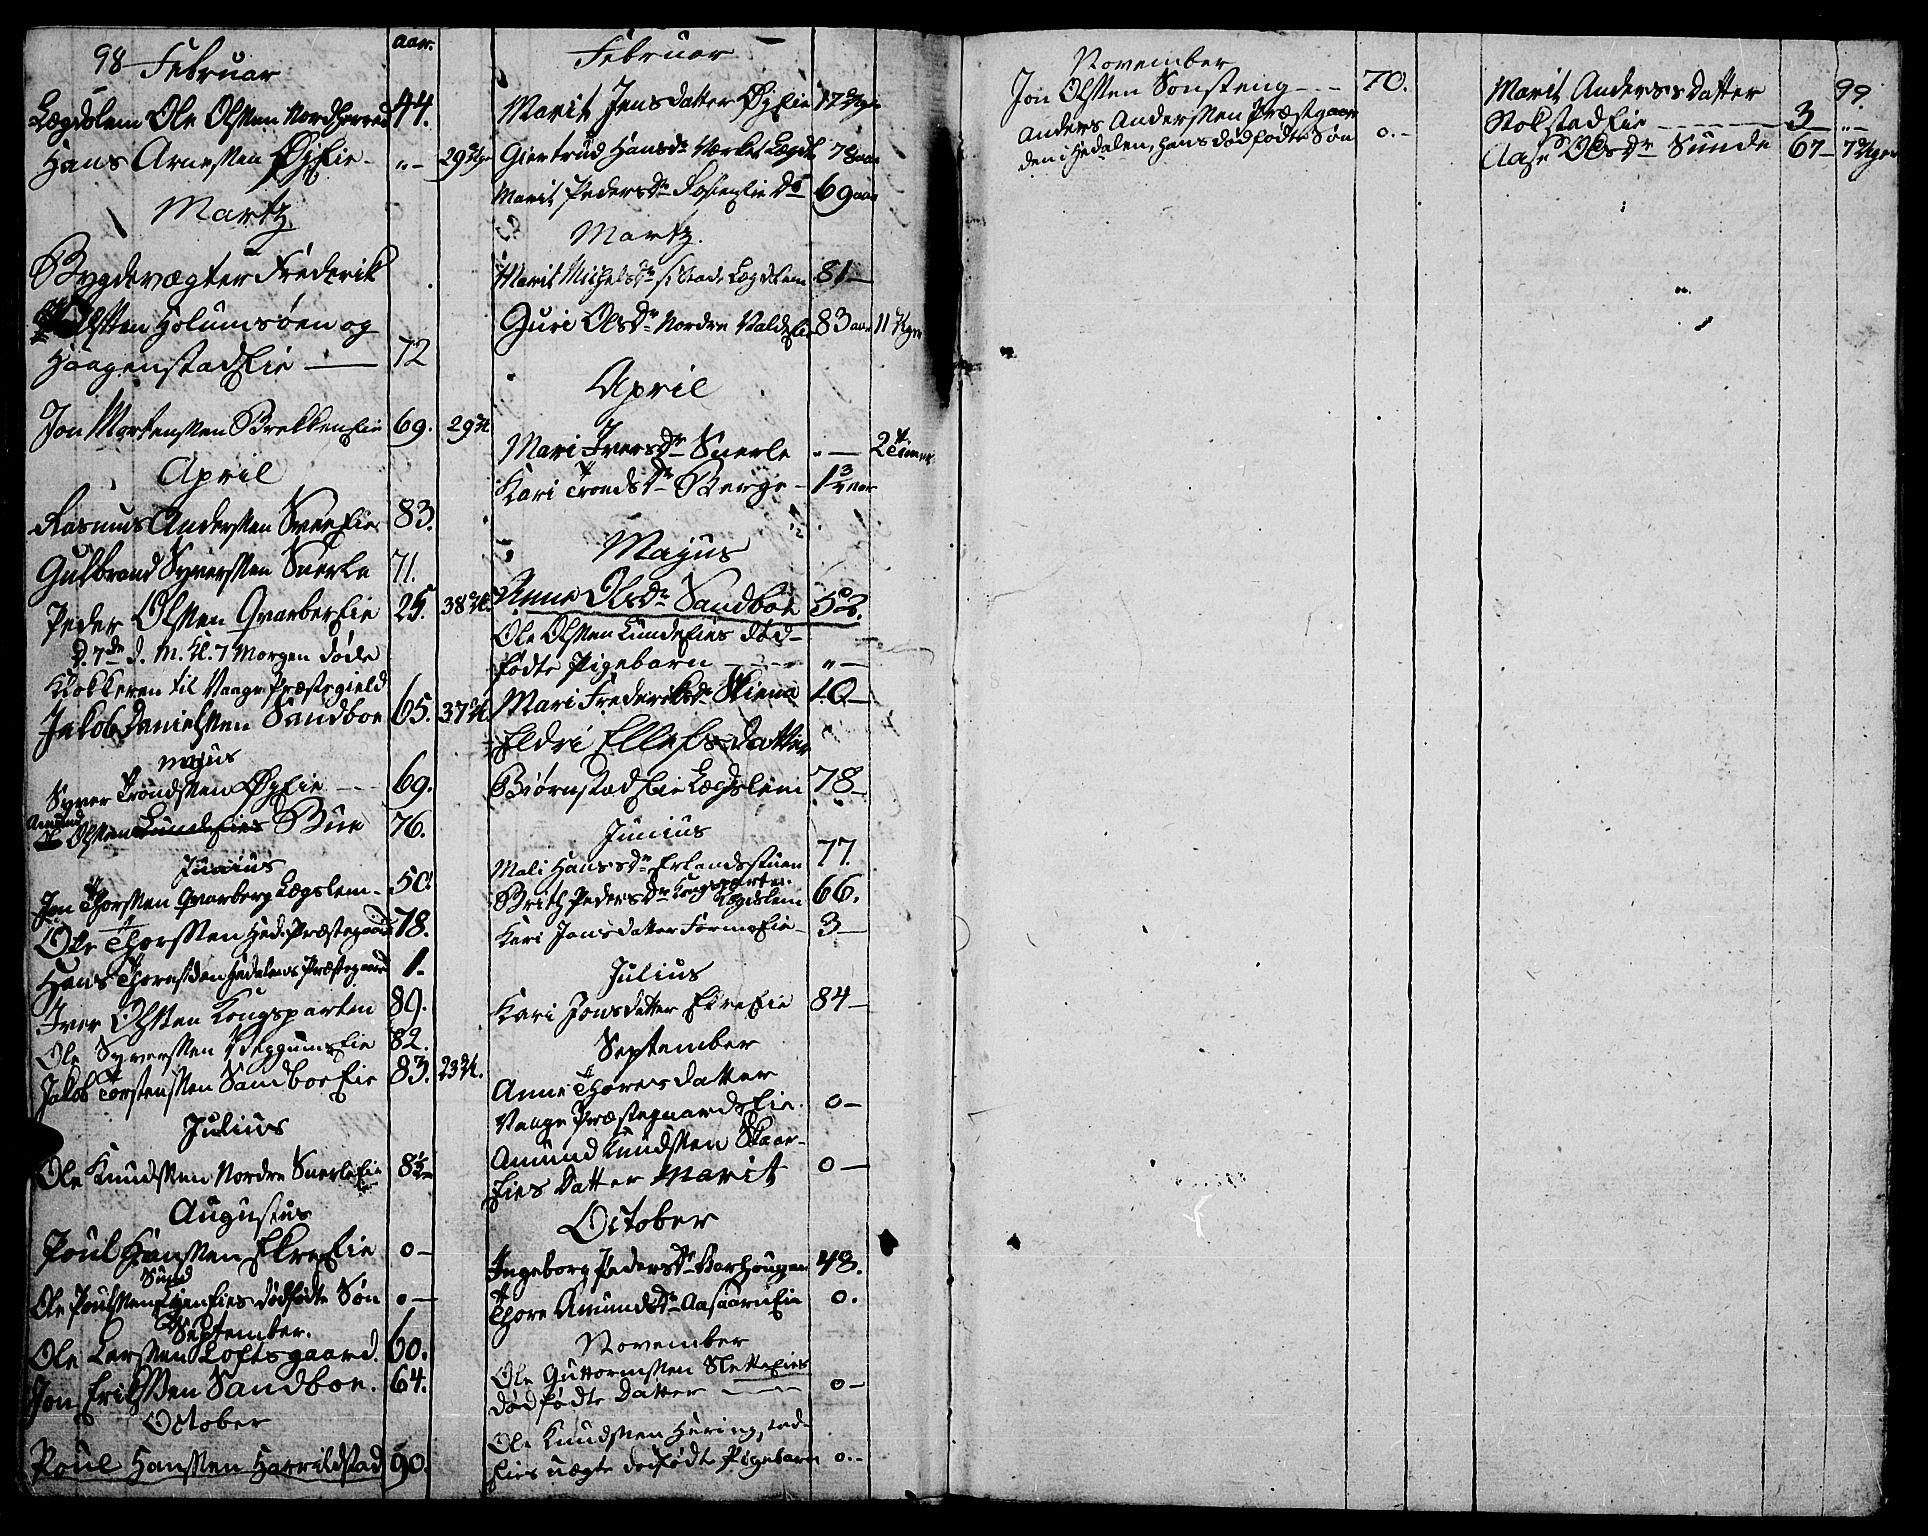 SAH, Vågå prestekontor, Ministerialbok nr. 2, 1810-1815, s. 98-99